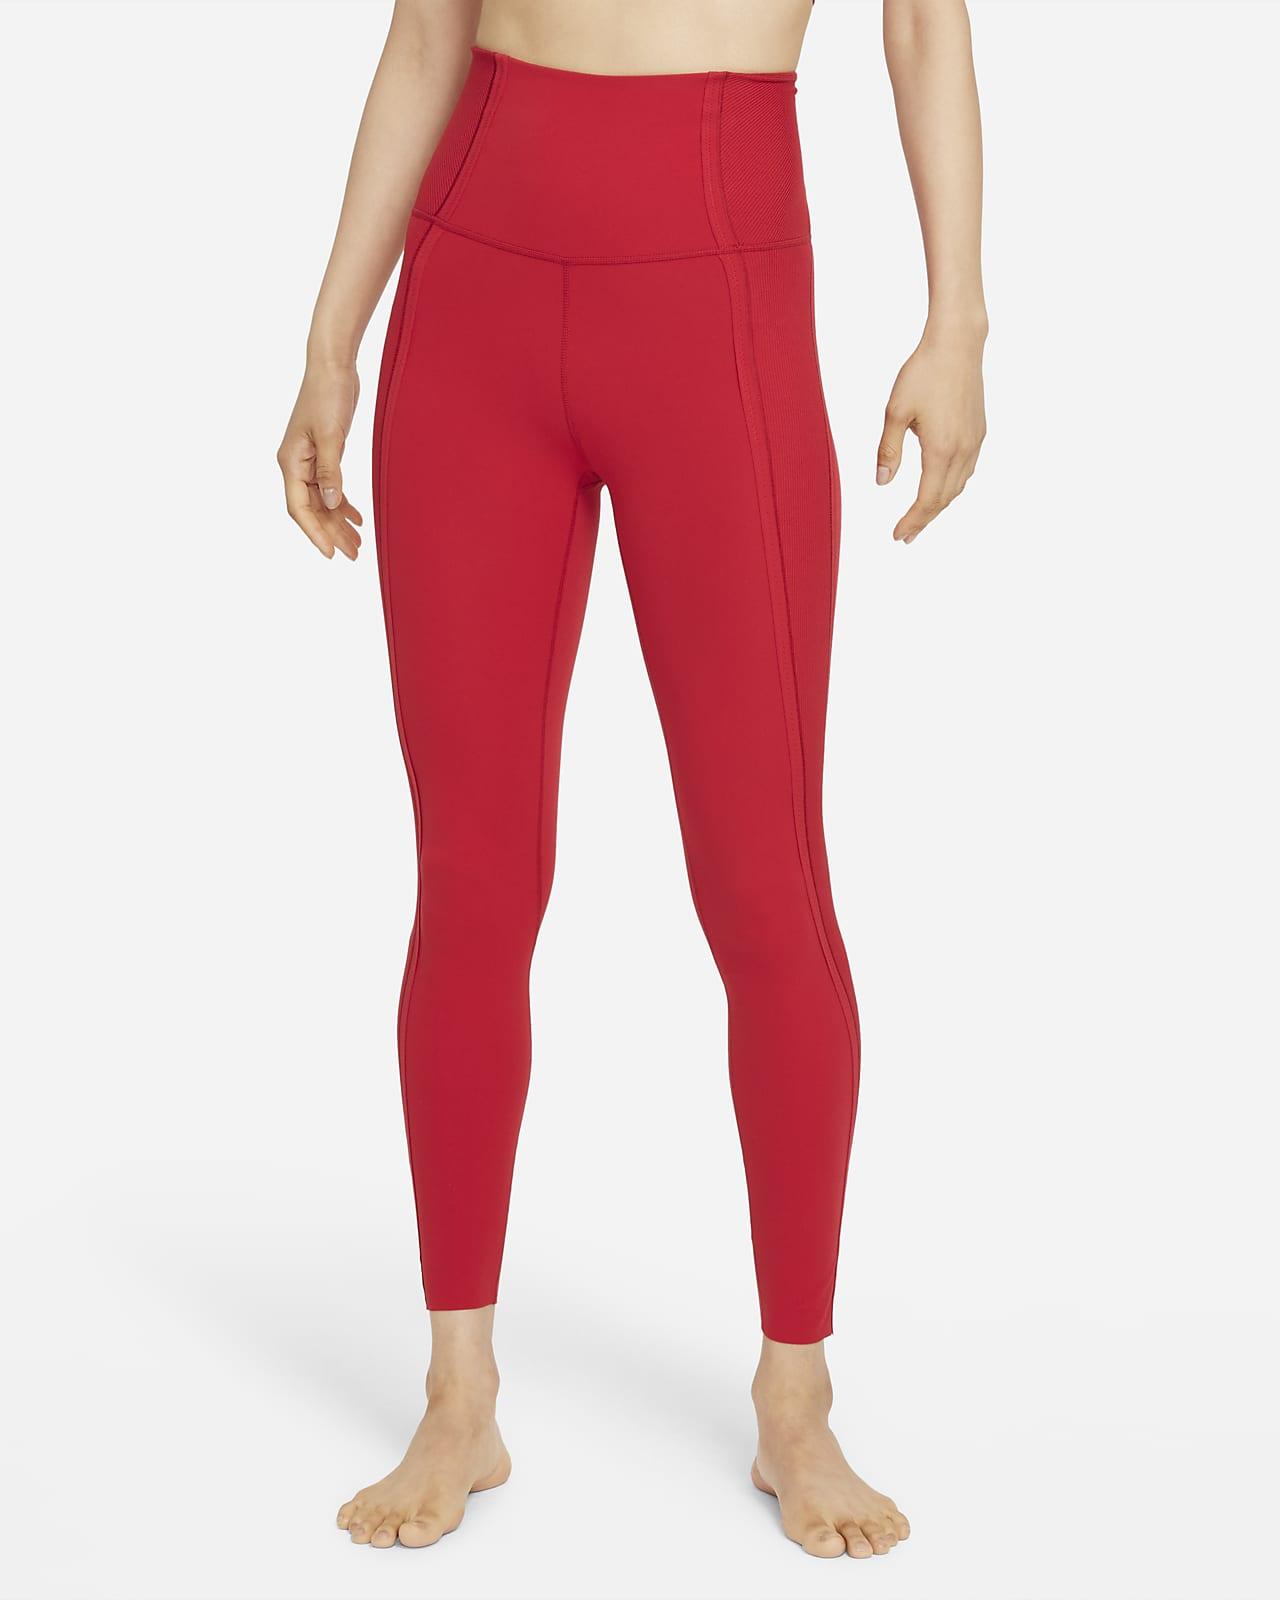 Nike Yoga Luxe Dri-FIT 女款 Infinalon 高腰九分內搭褲